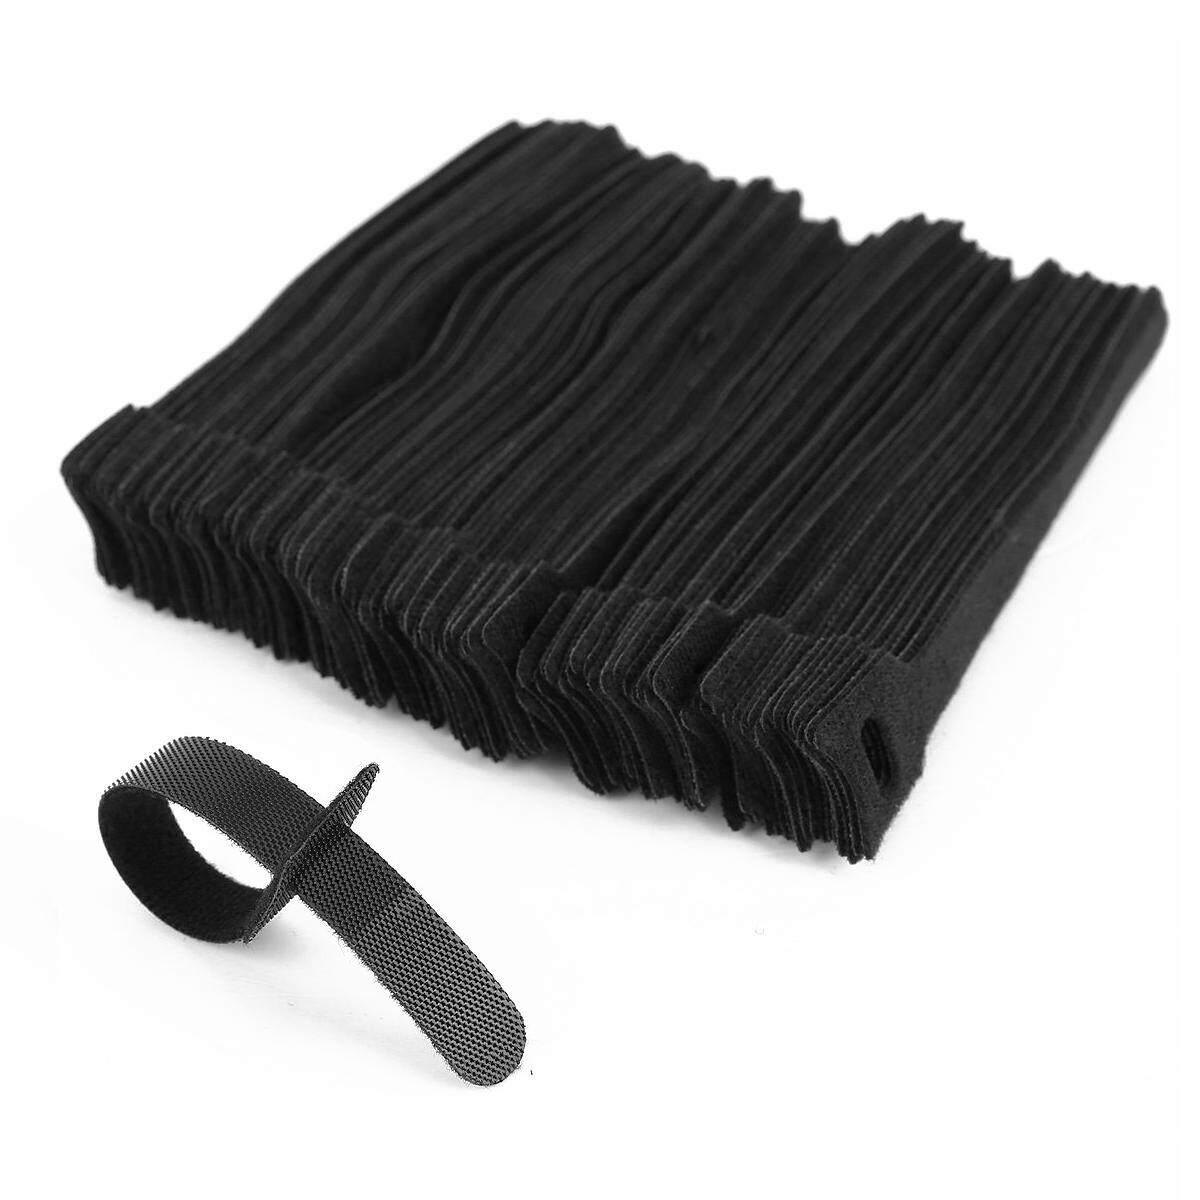 100 x adjustable black nylon cable tie L 15cm - intl